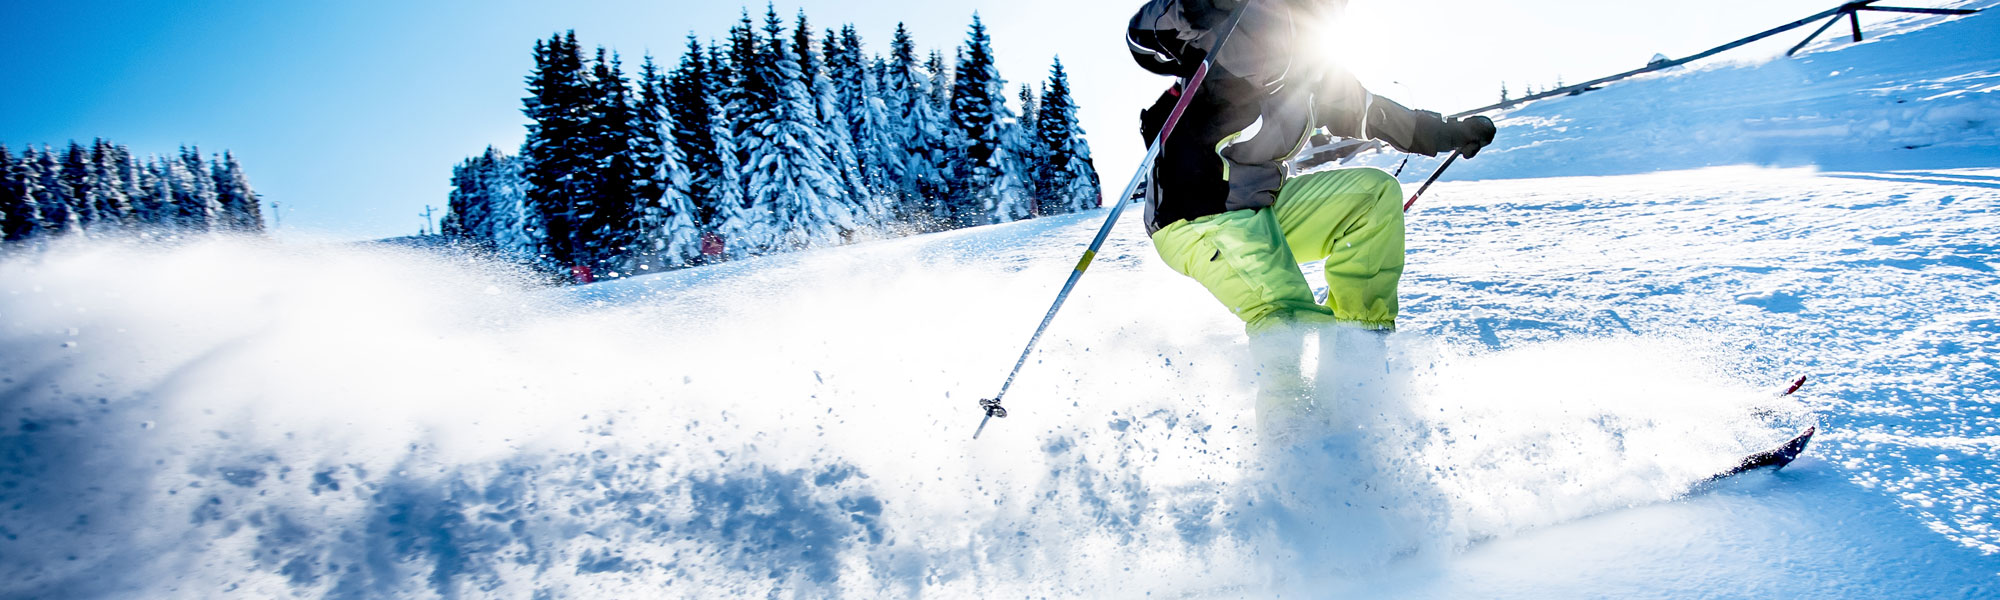 Skifahrer - Reisekombi